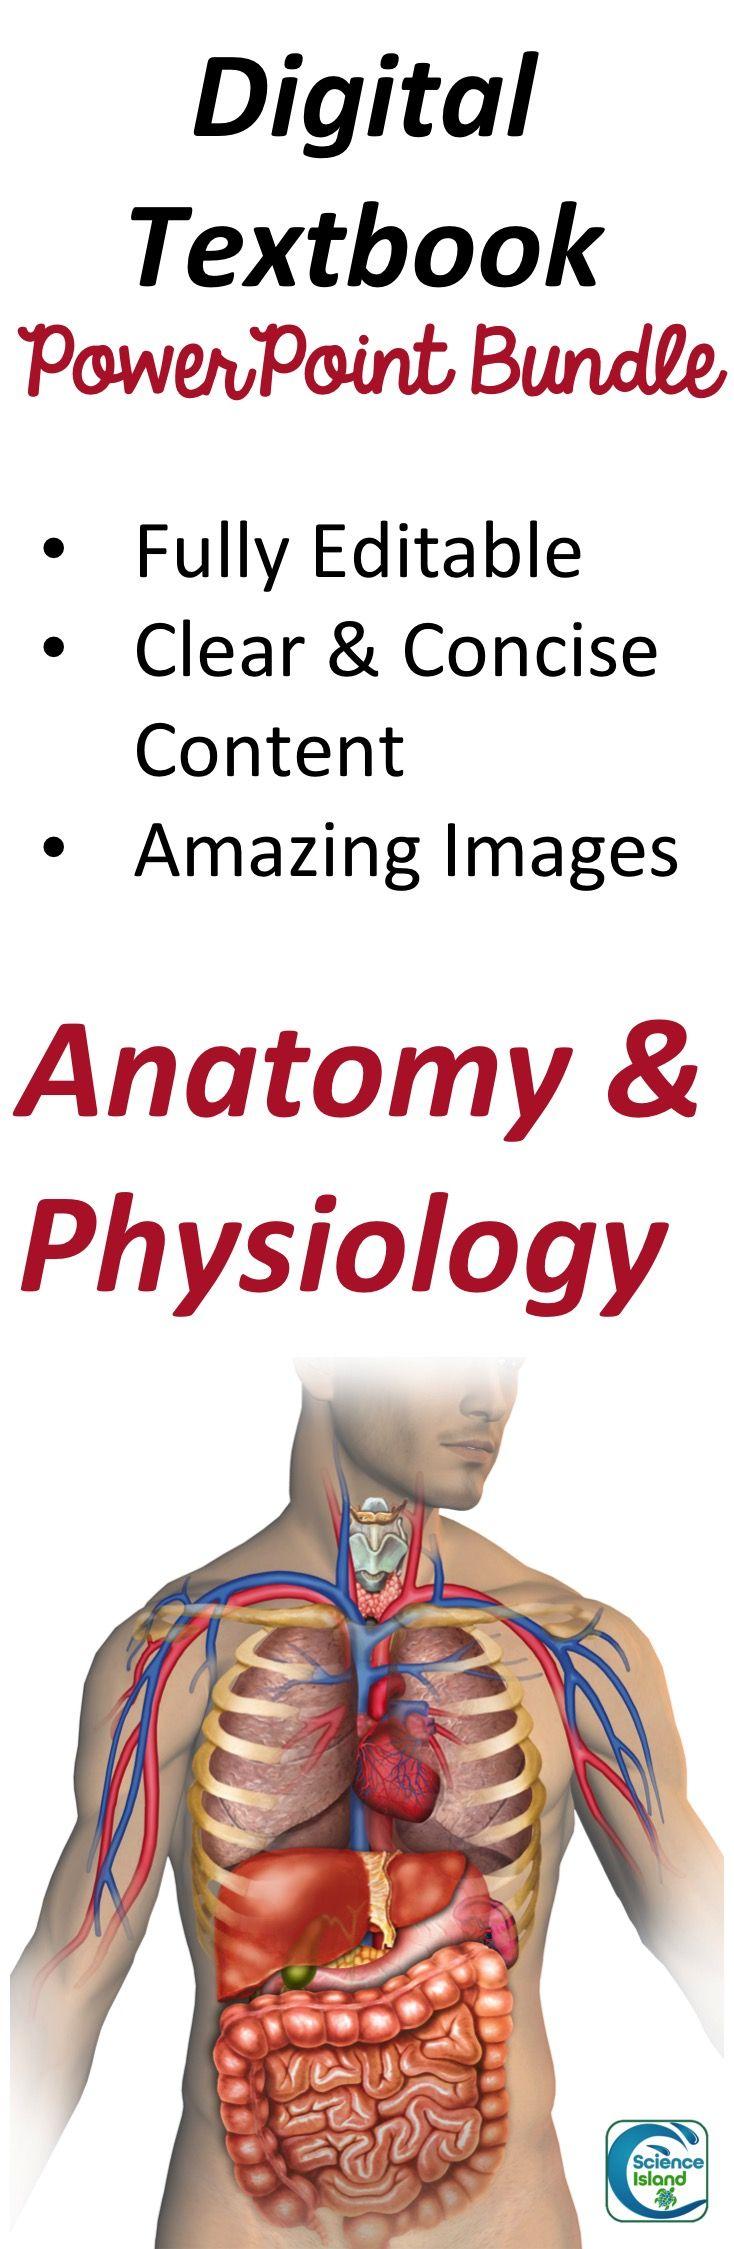 Atemberaubend Anatomy And Physiology Curriculum Galerie ...